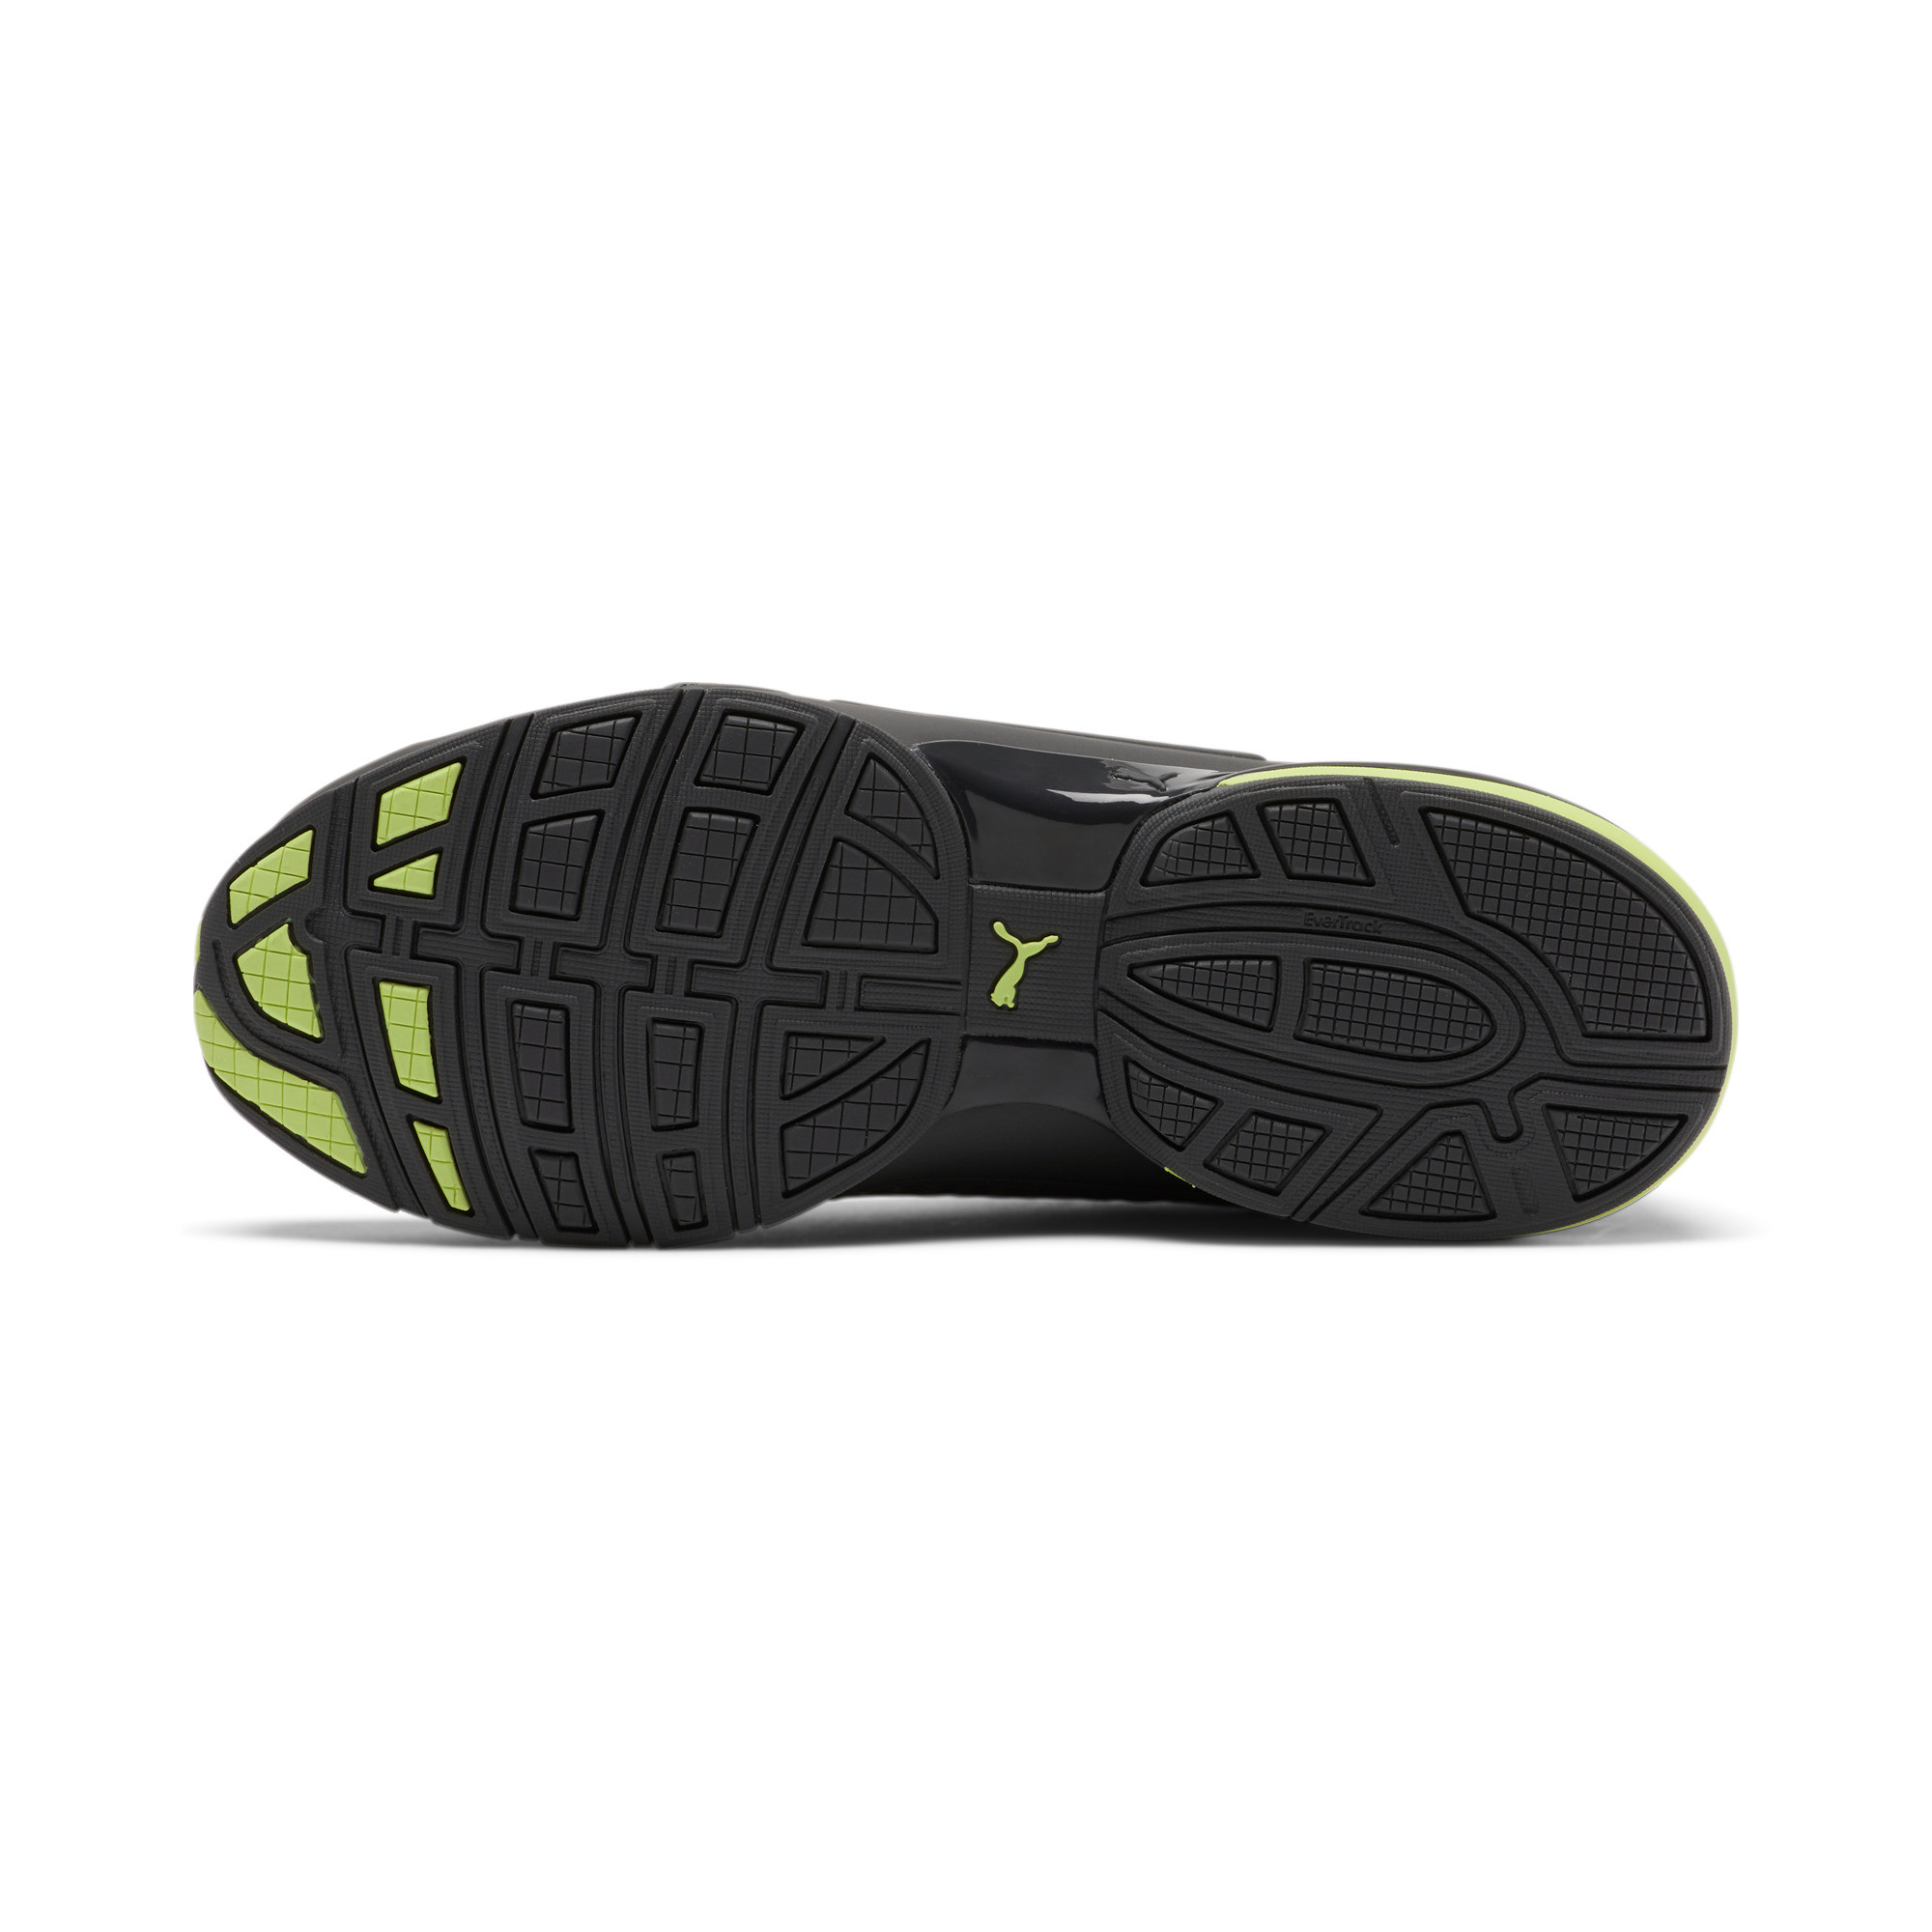 thumbnail 8 - PUMA Men's Viz Runner Graphic Sneakers